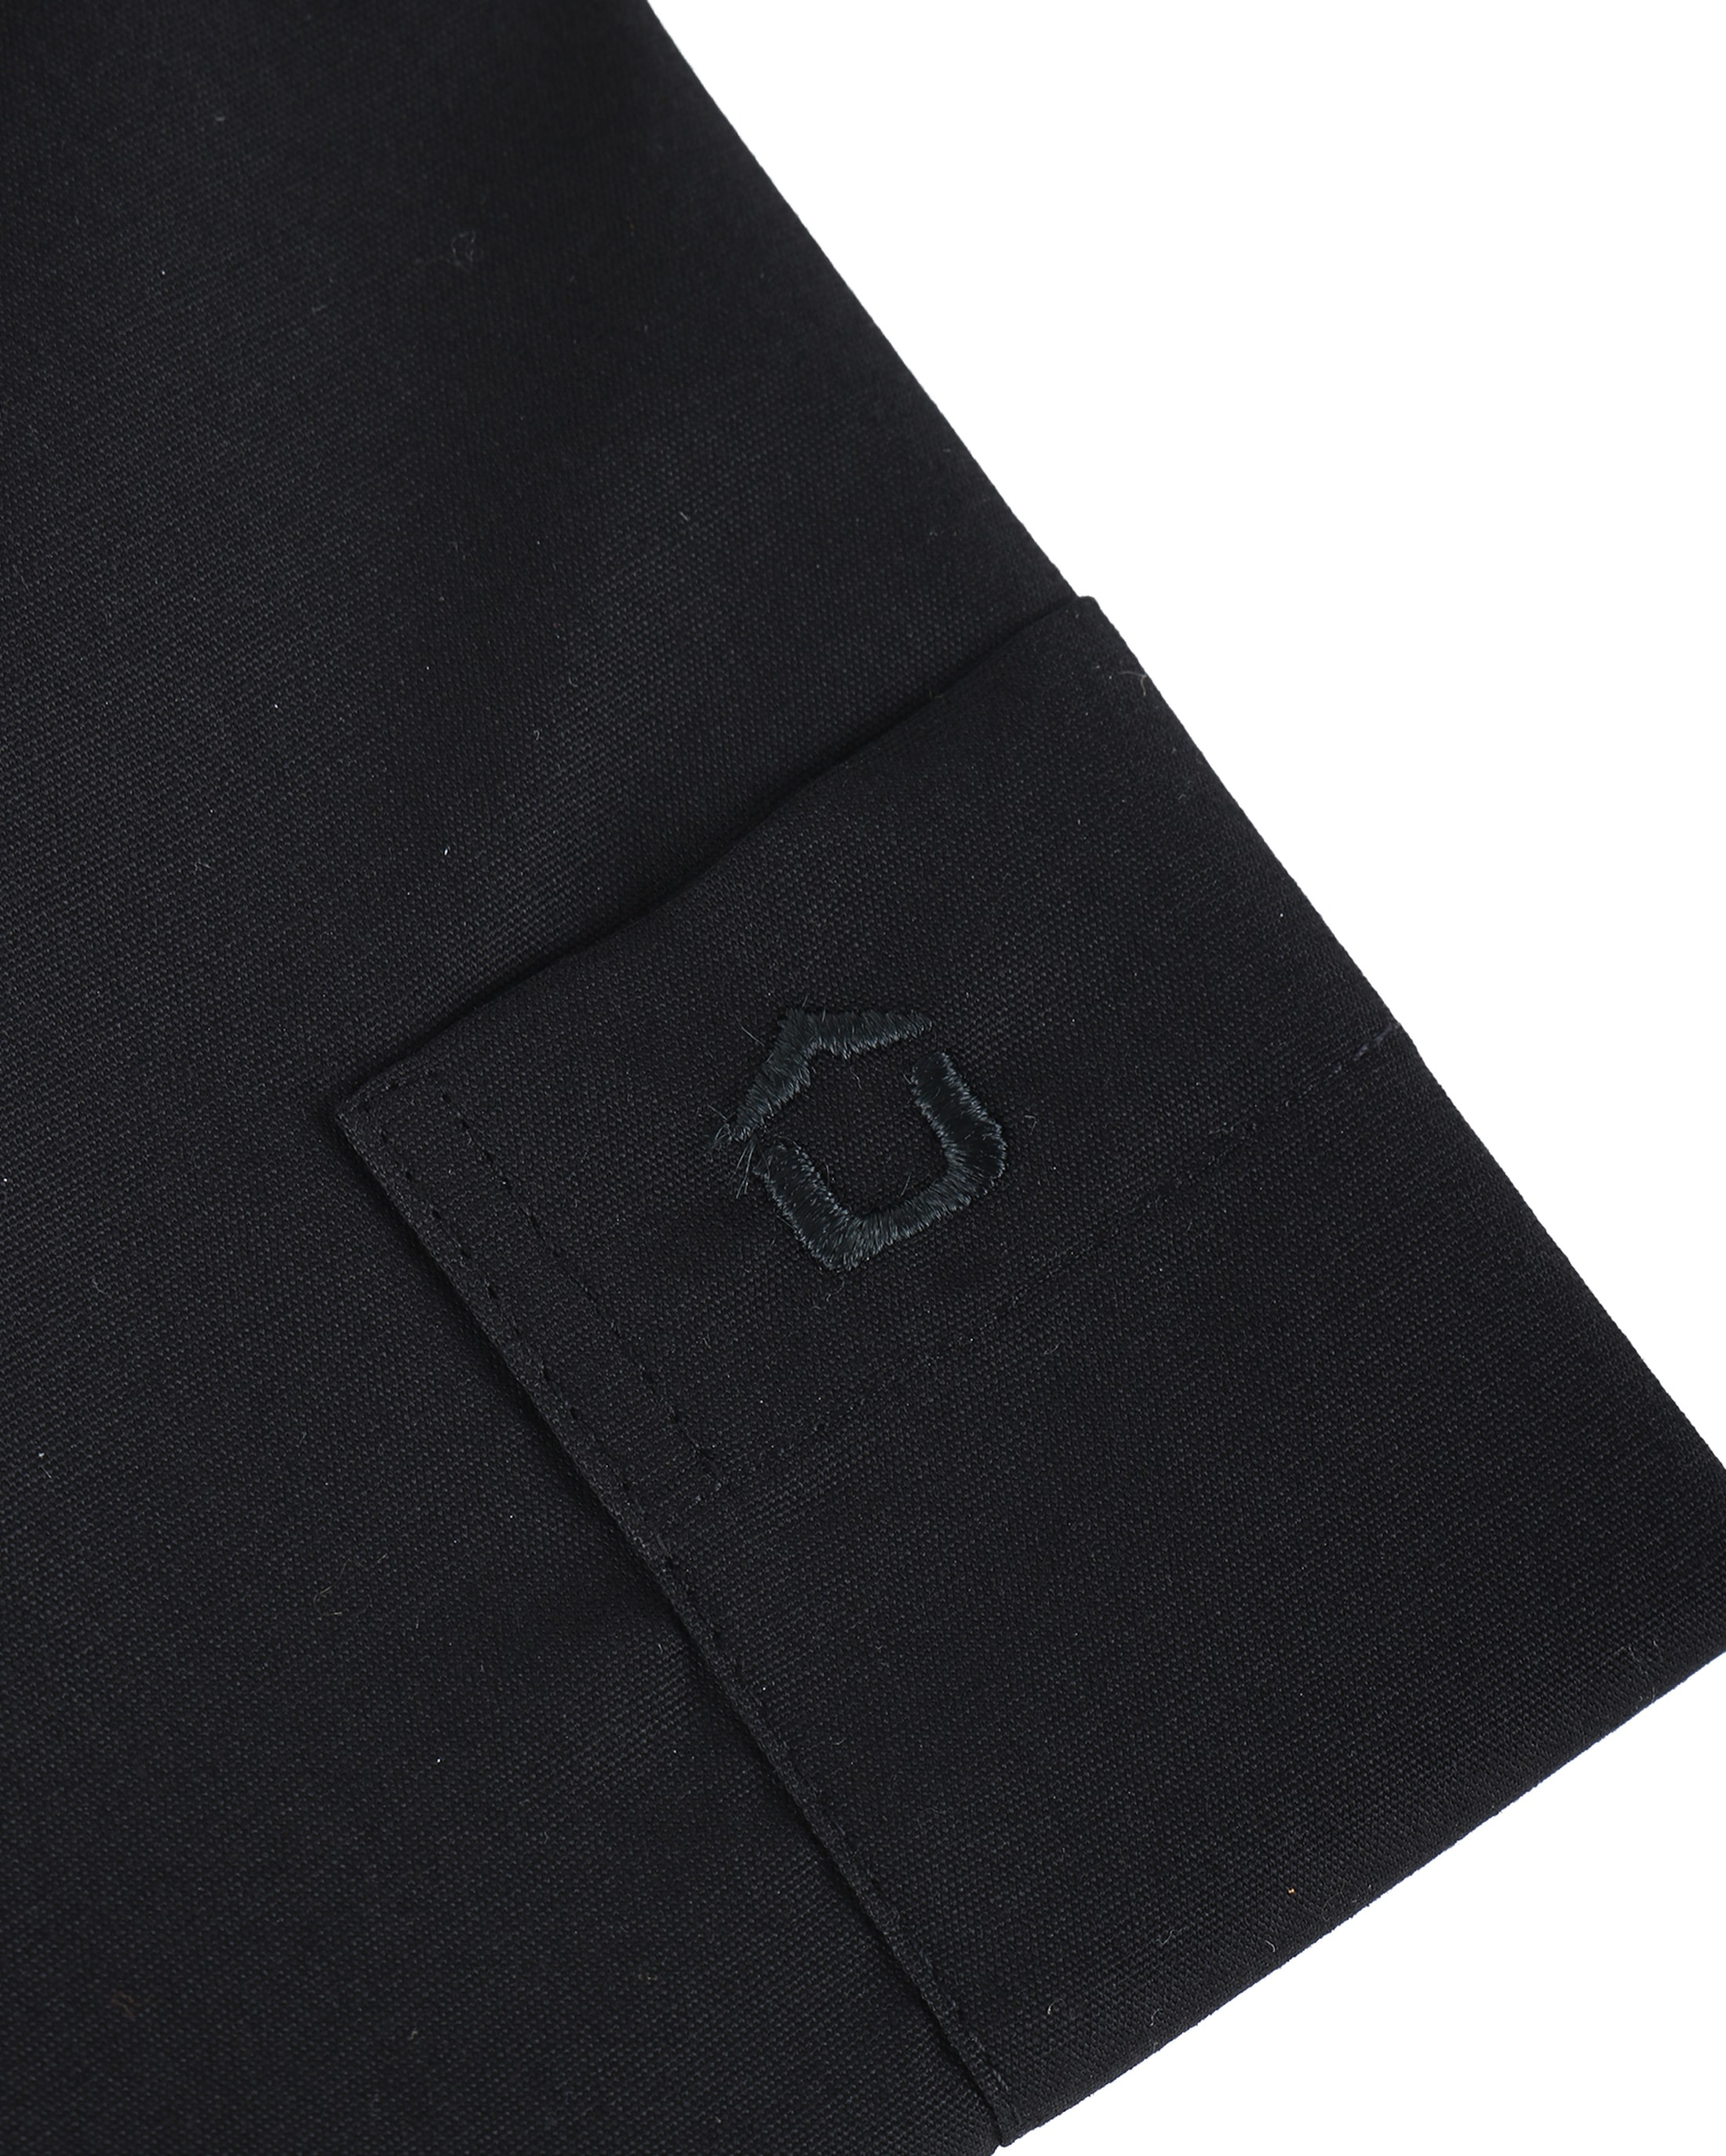 Ledub Overhemd Zwart Modern Fit foto 2